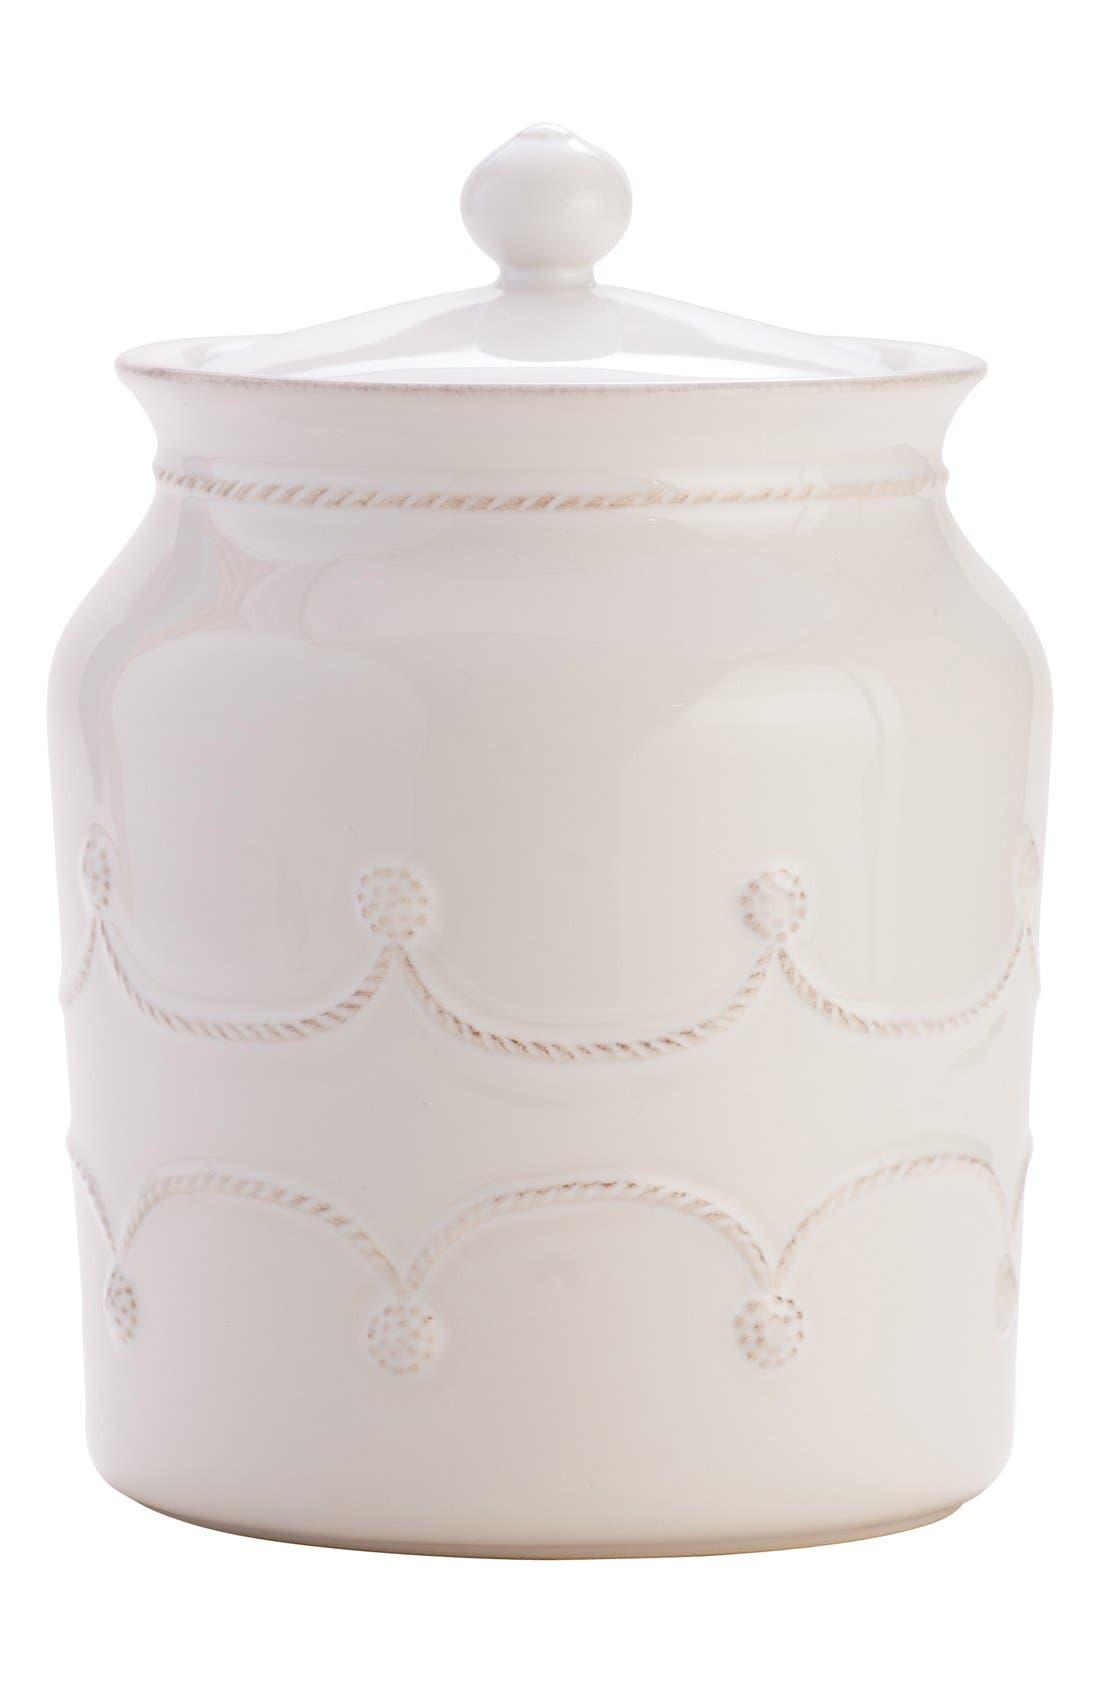 Juliska'Berry and Thread' Ceramic Cookie Jar